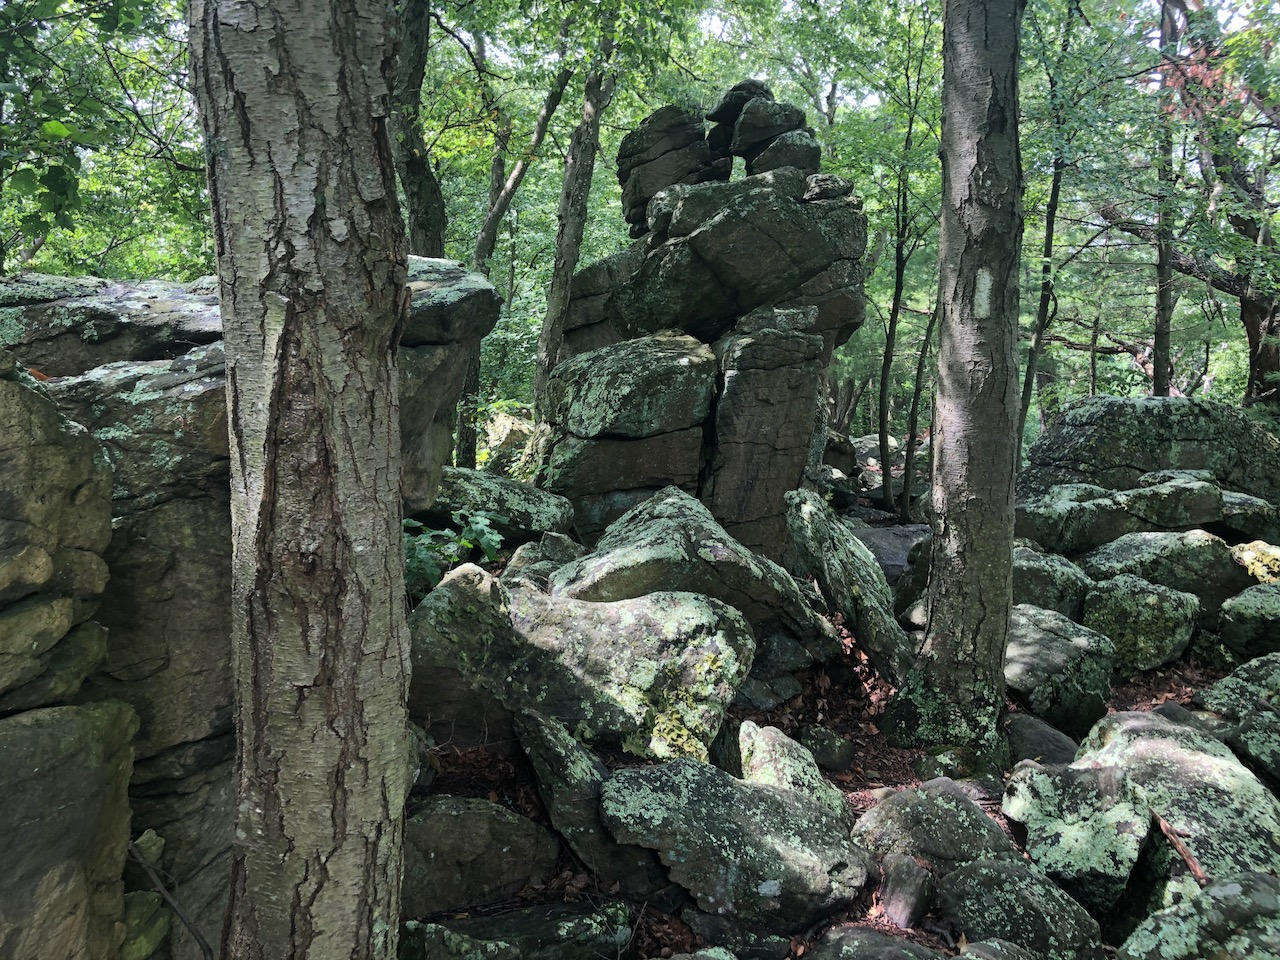 Photo of mossy rocks